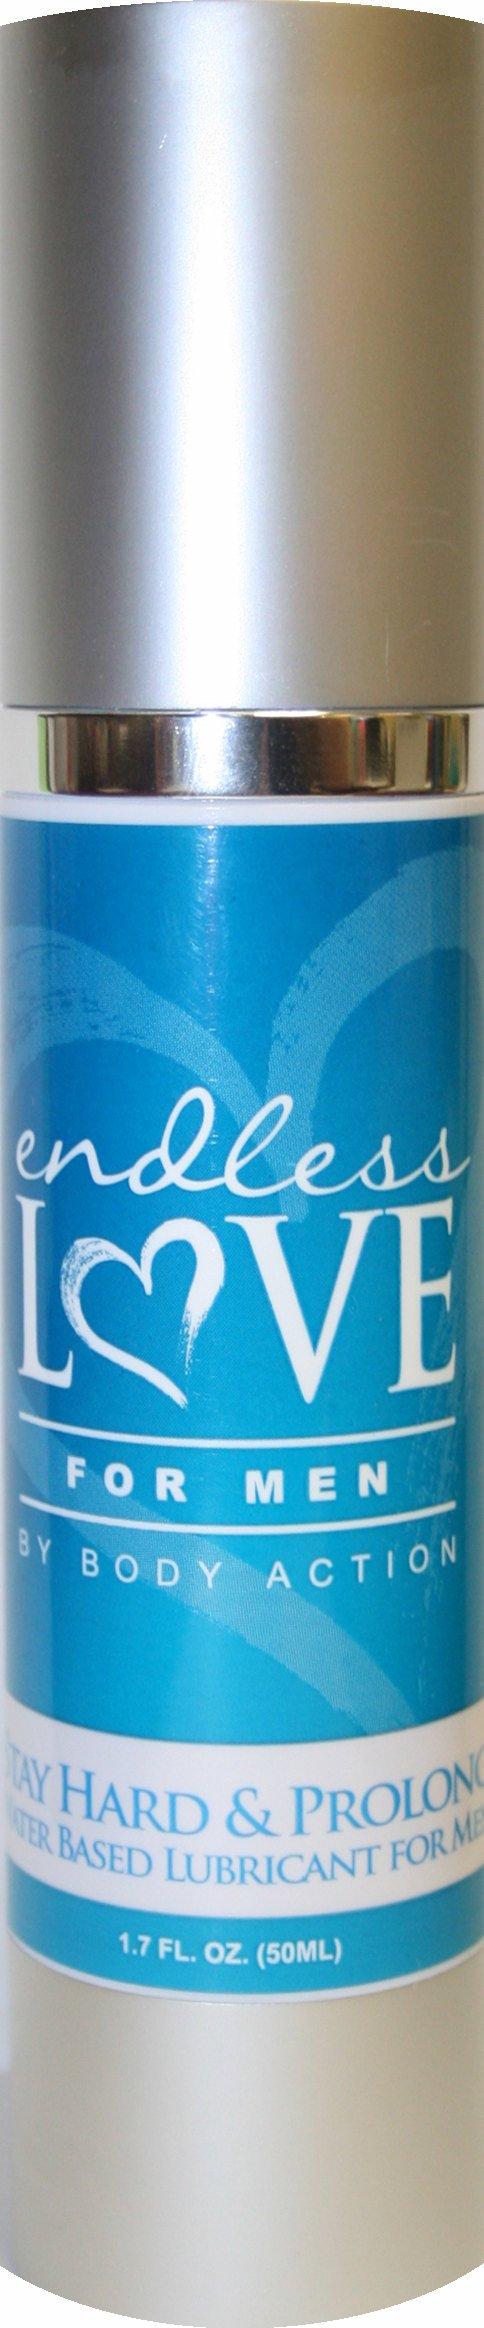 Endless Love For Men Stayhard & Prolong